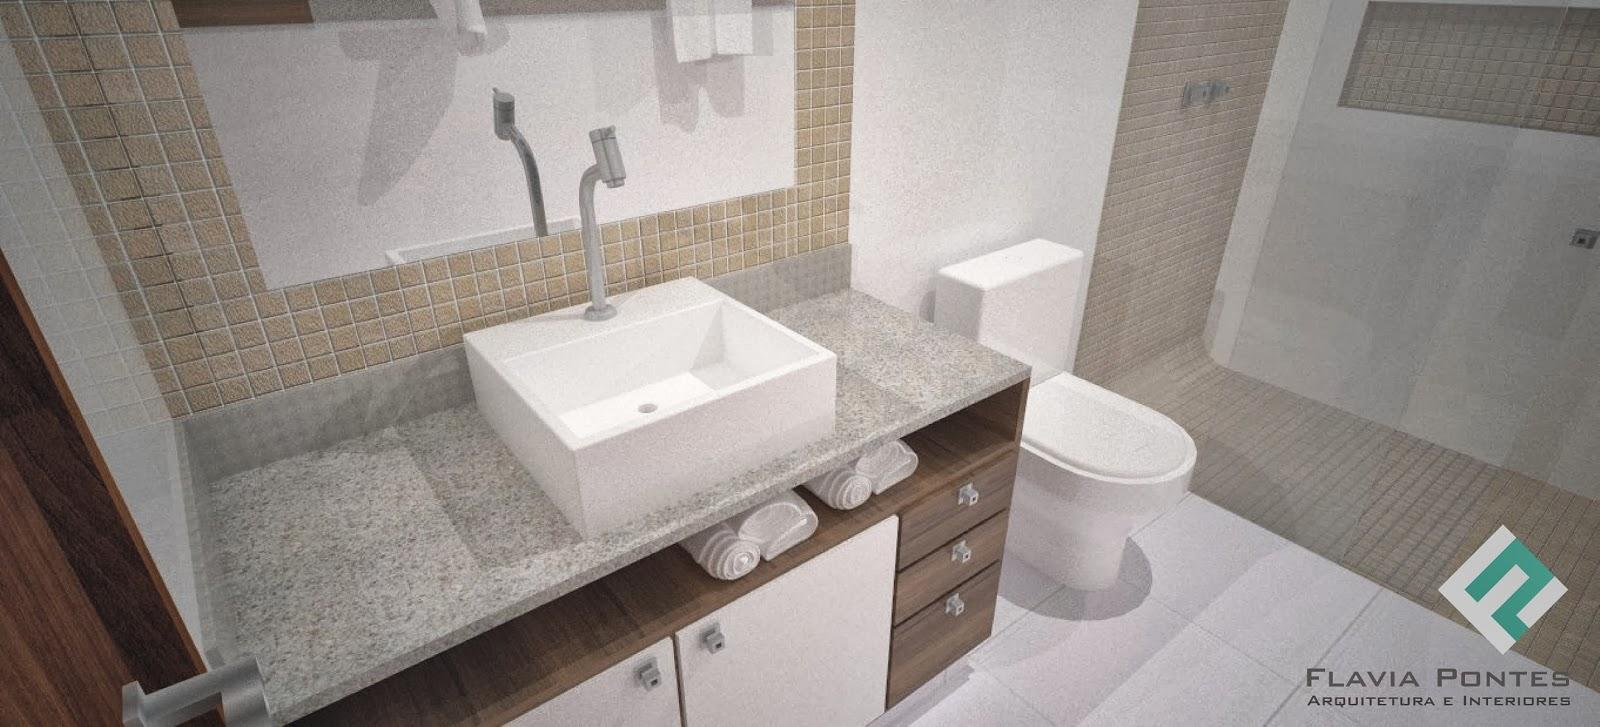 Flavia Pontes Arquitetura # Banheiro Pequeno Creme